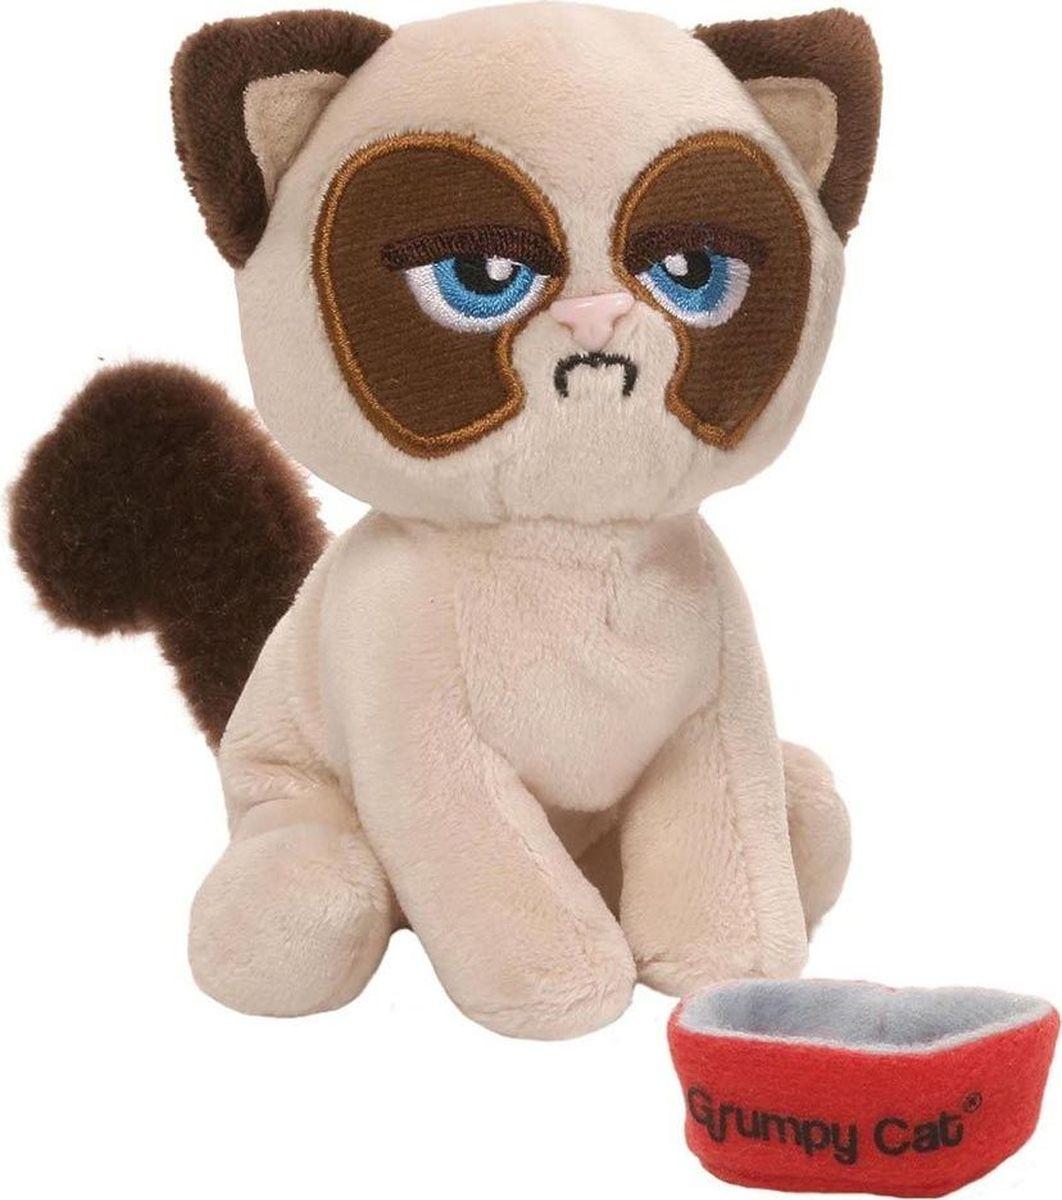 Gund Мягкая игрушка Box O Grump Grumpy Cat Everyday 11,5 см gund мягкая игрушка grumpy cat 23 см